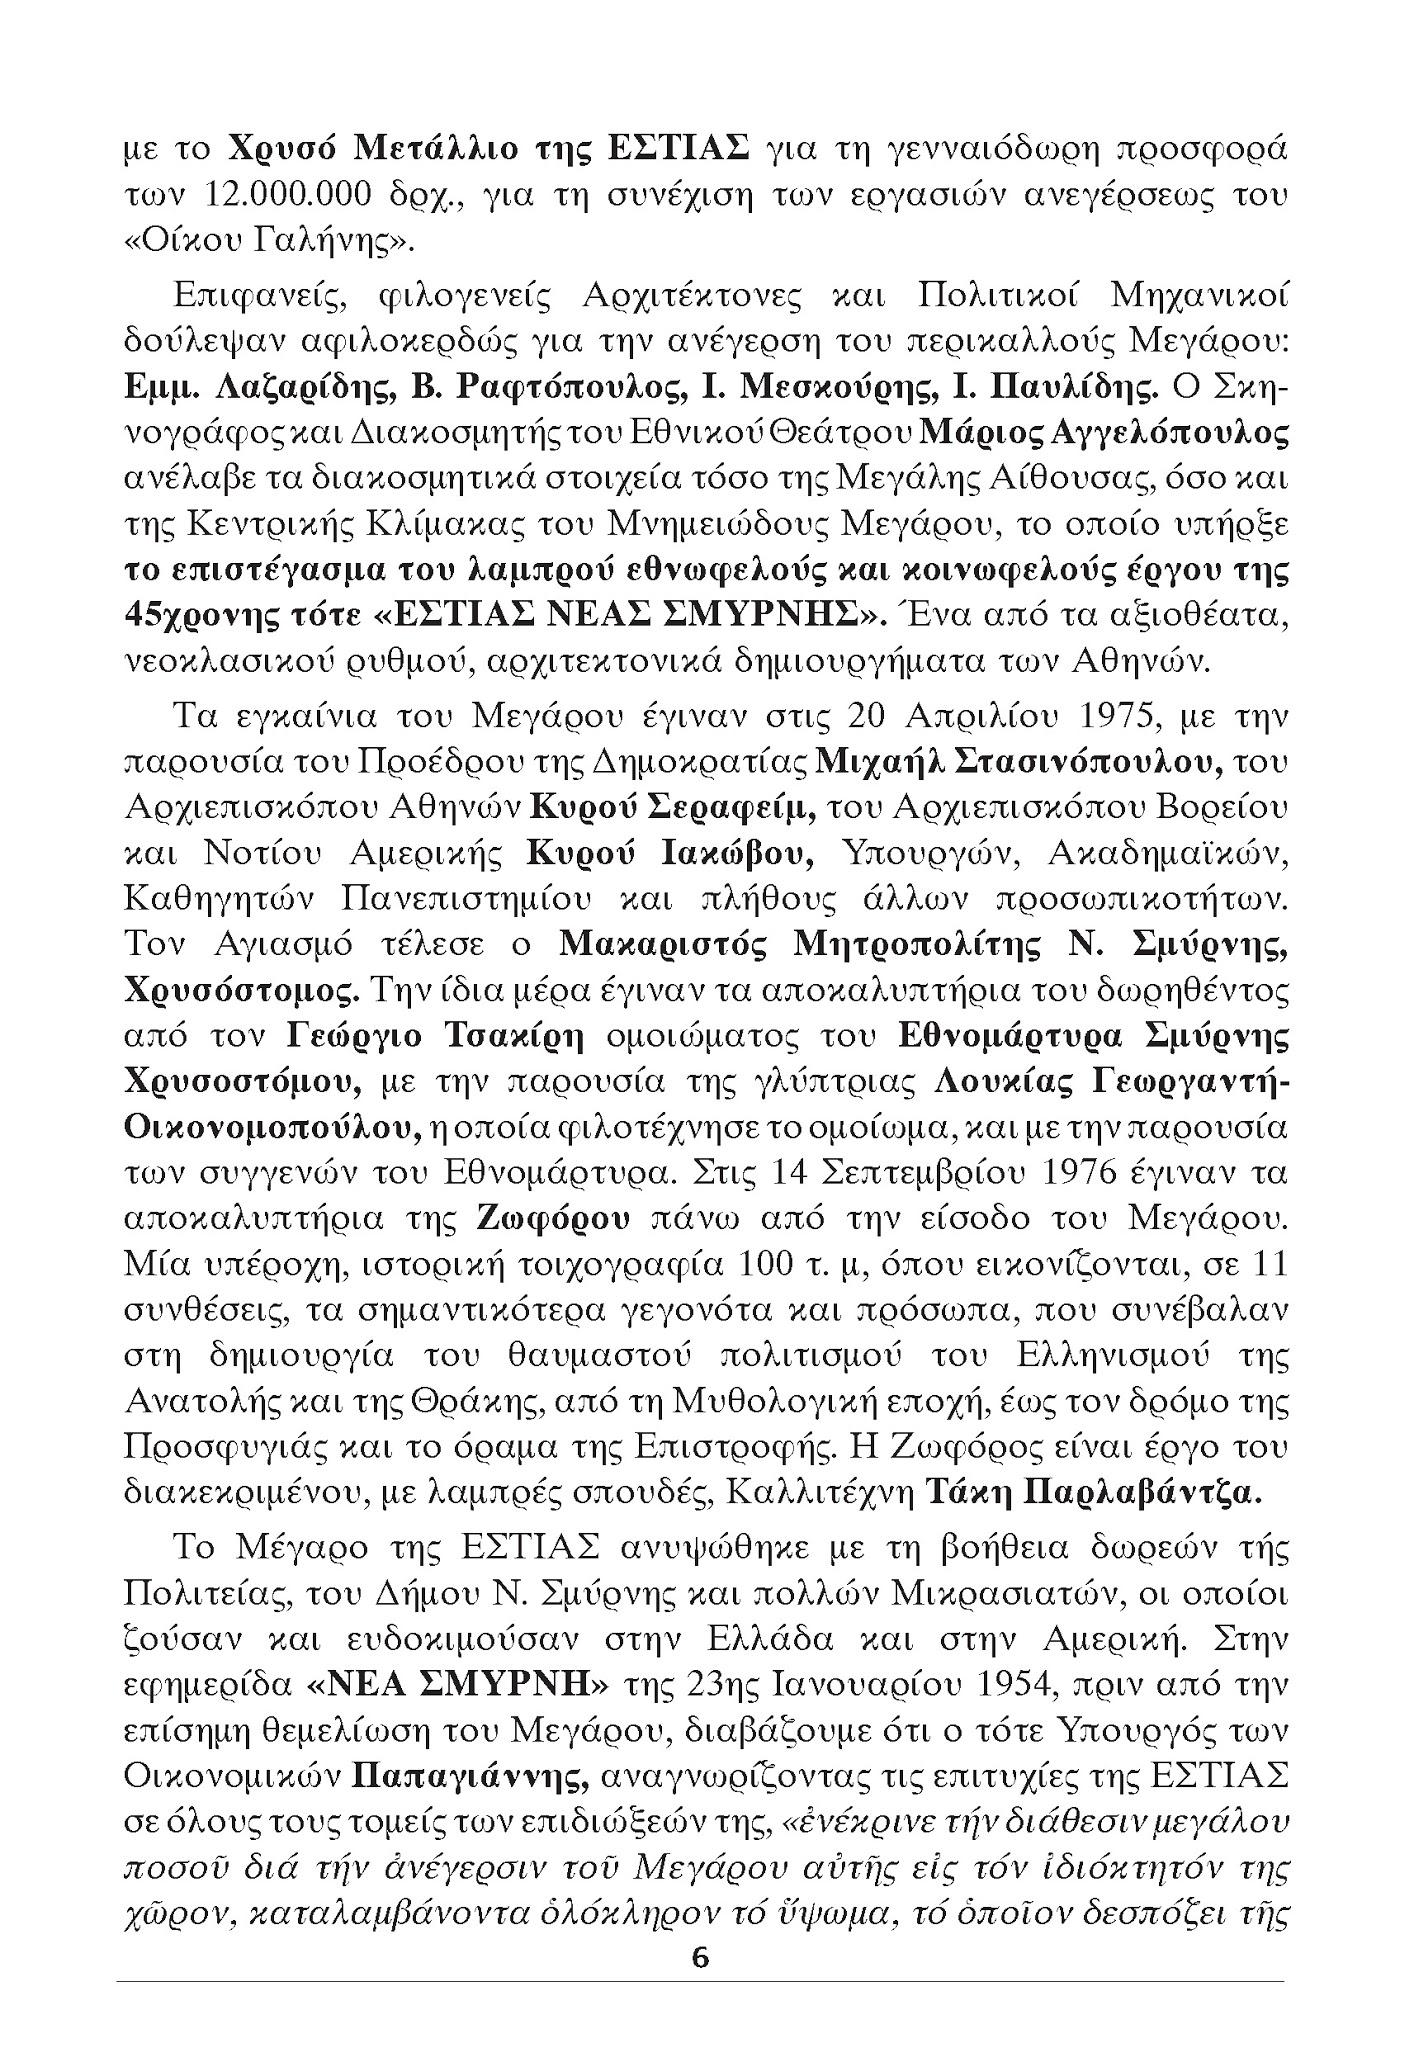 Photo: ΕΣΤΙΑ ΝΕΑΣ ΣΜΥΡΝΗΣ: «Το θαύμα της Πίστης στις Αθάνατες αξίες, στον Εθελοντισμό και στη Συλλογικότητα», της Βιργινίας Χαμουδοπούλου-Κωνσταντινίδου, Γενικής Γραμματέως της Εστίας, Δεκέμβριος 2015, σελ. 6.